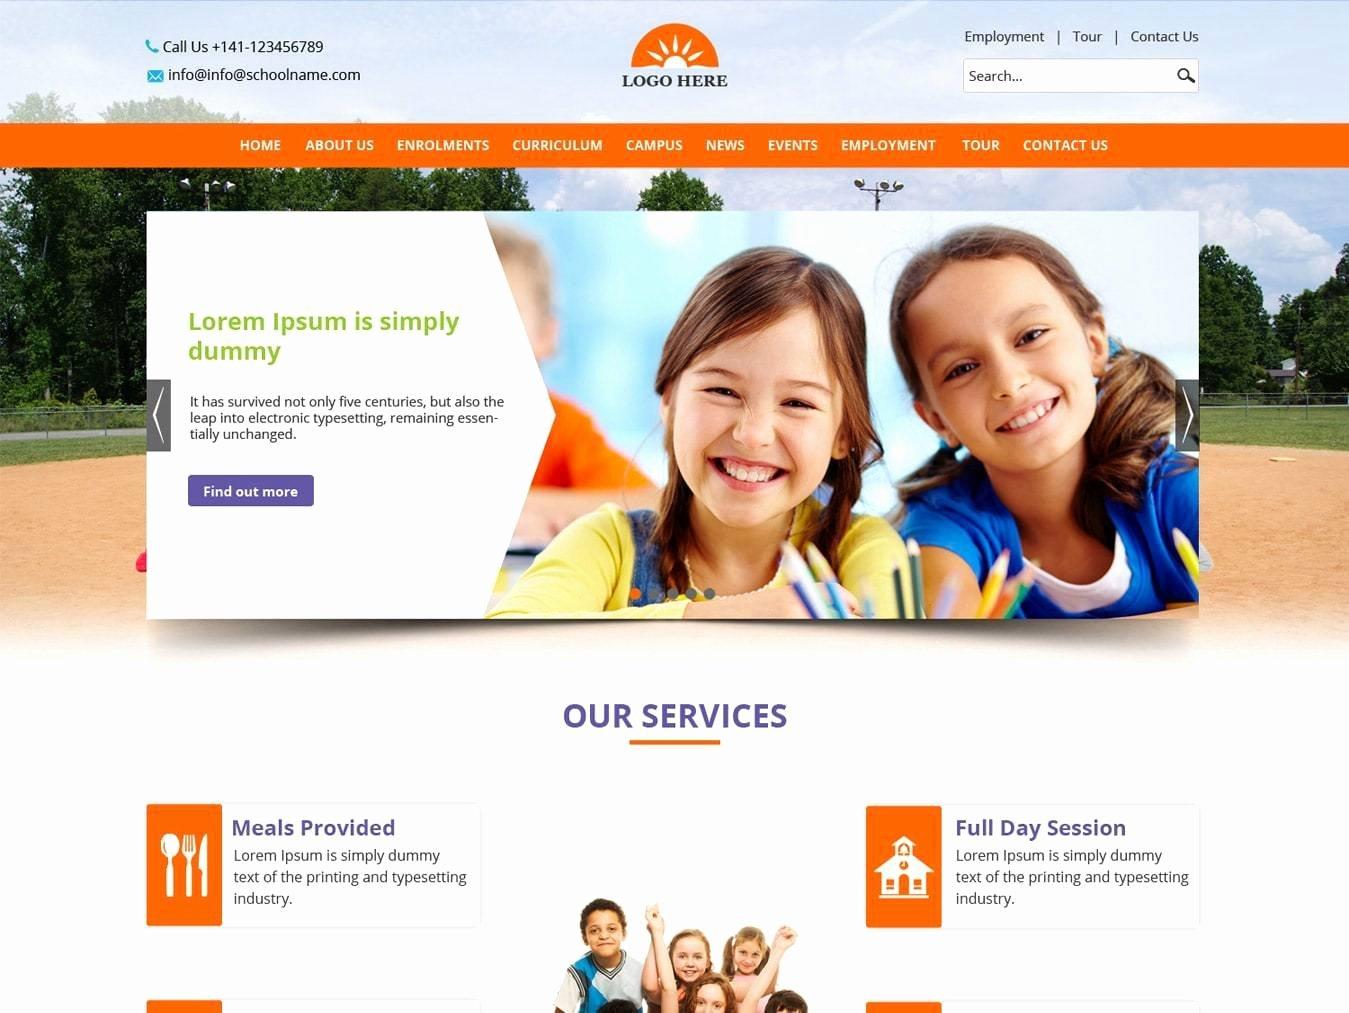 School Web Site Template Awesome Creative Blog Website Template Design Free Psd Design